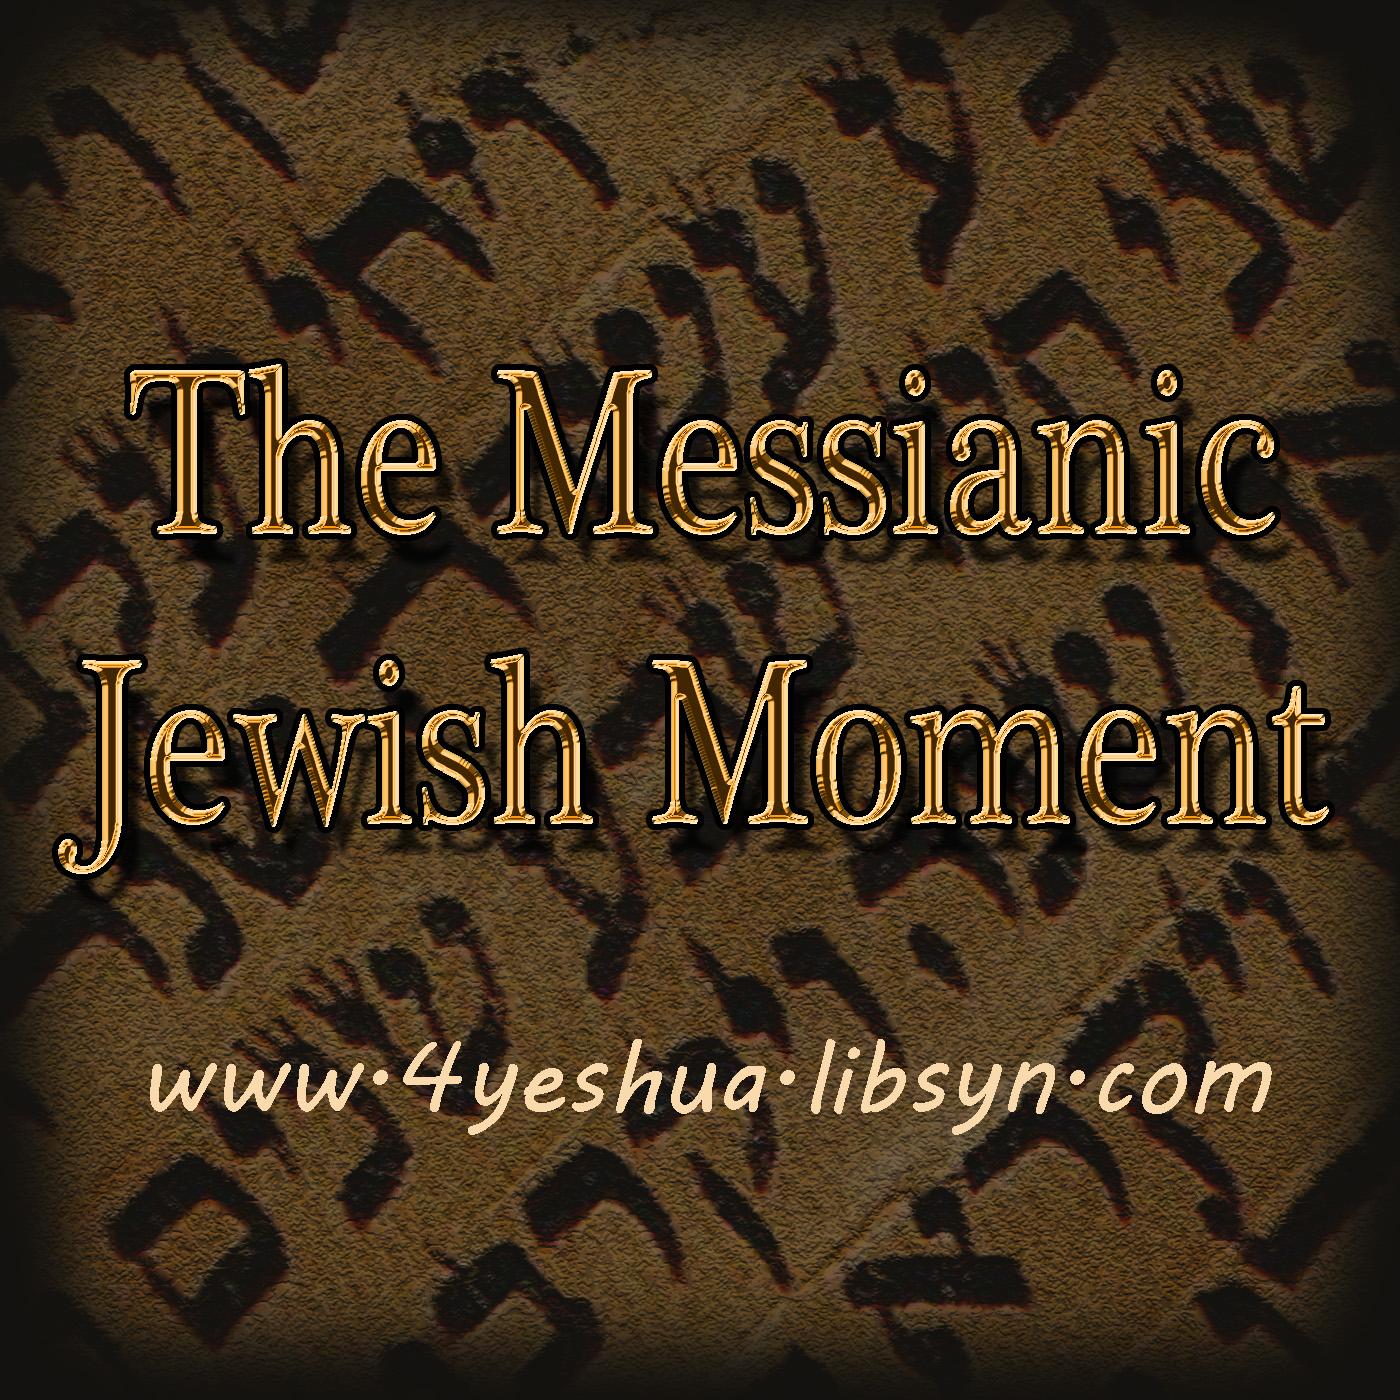 The Messianic Jewish Moment